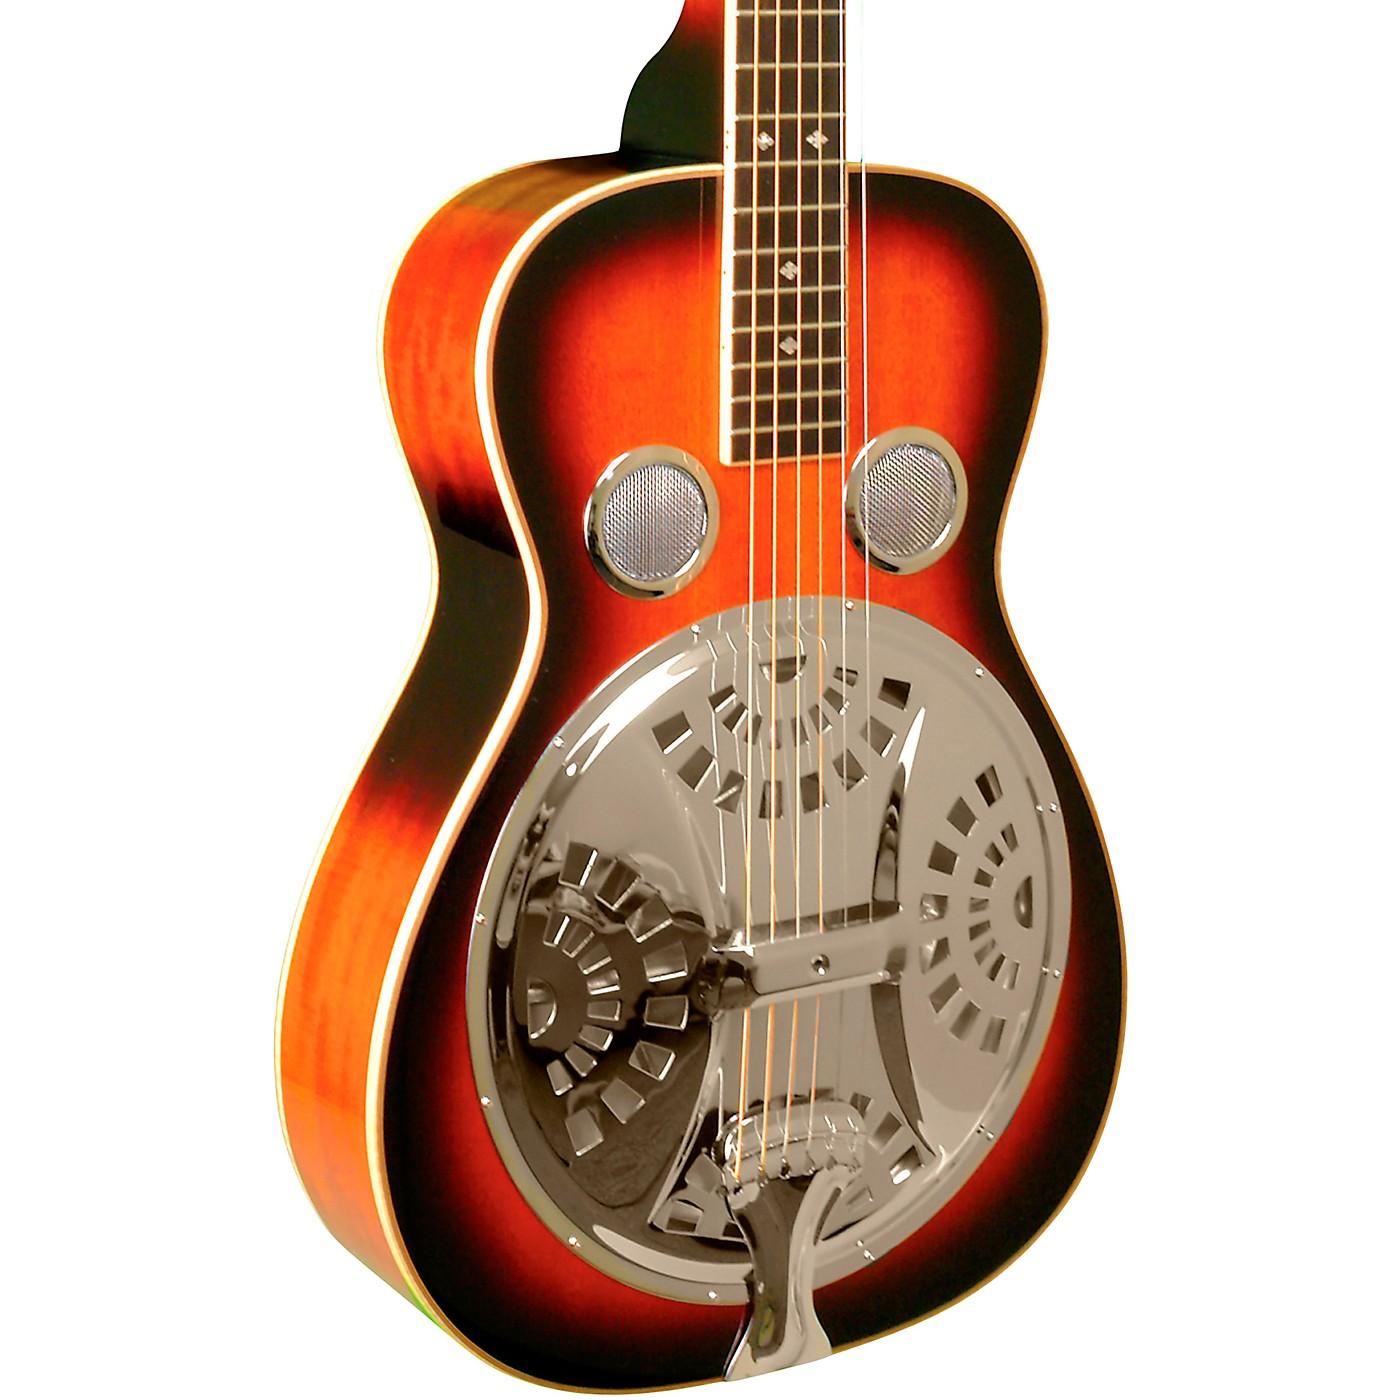 Gold Tone Left-Handed Paul Beard Squareneck S-Mahogany Resonator Guitar thumbnail